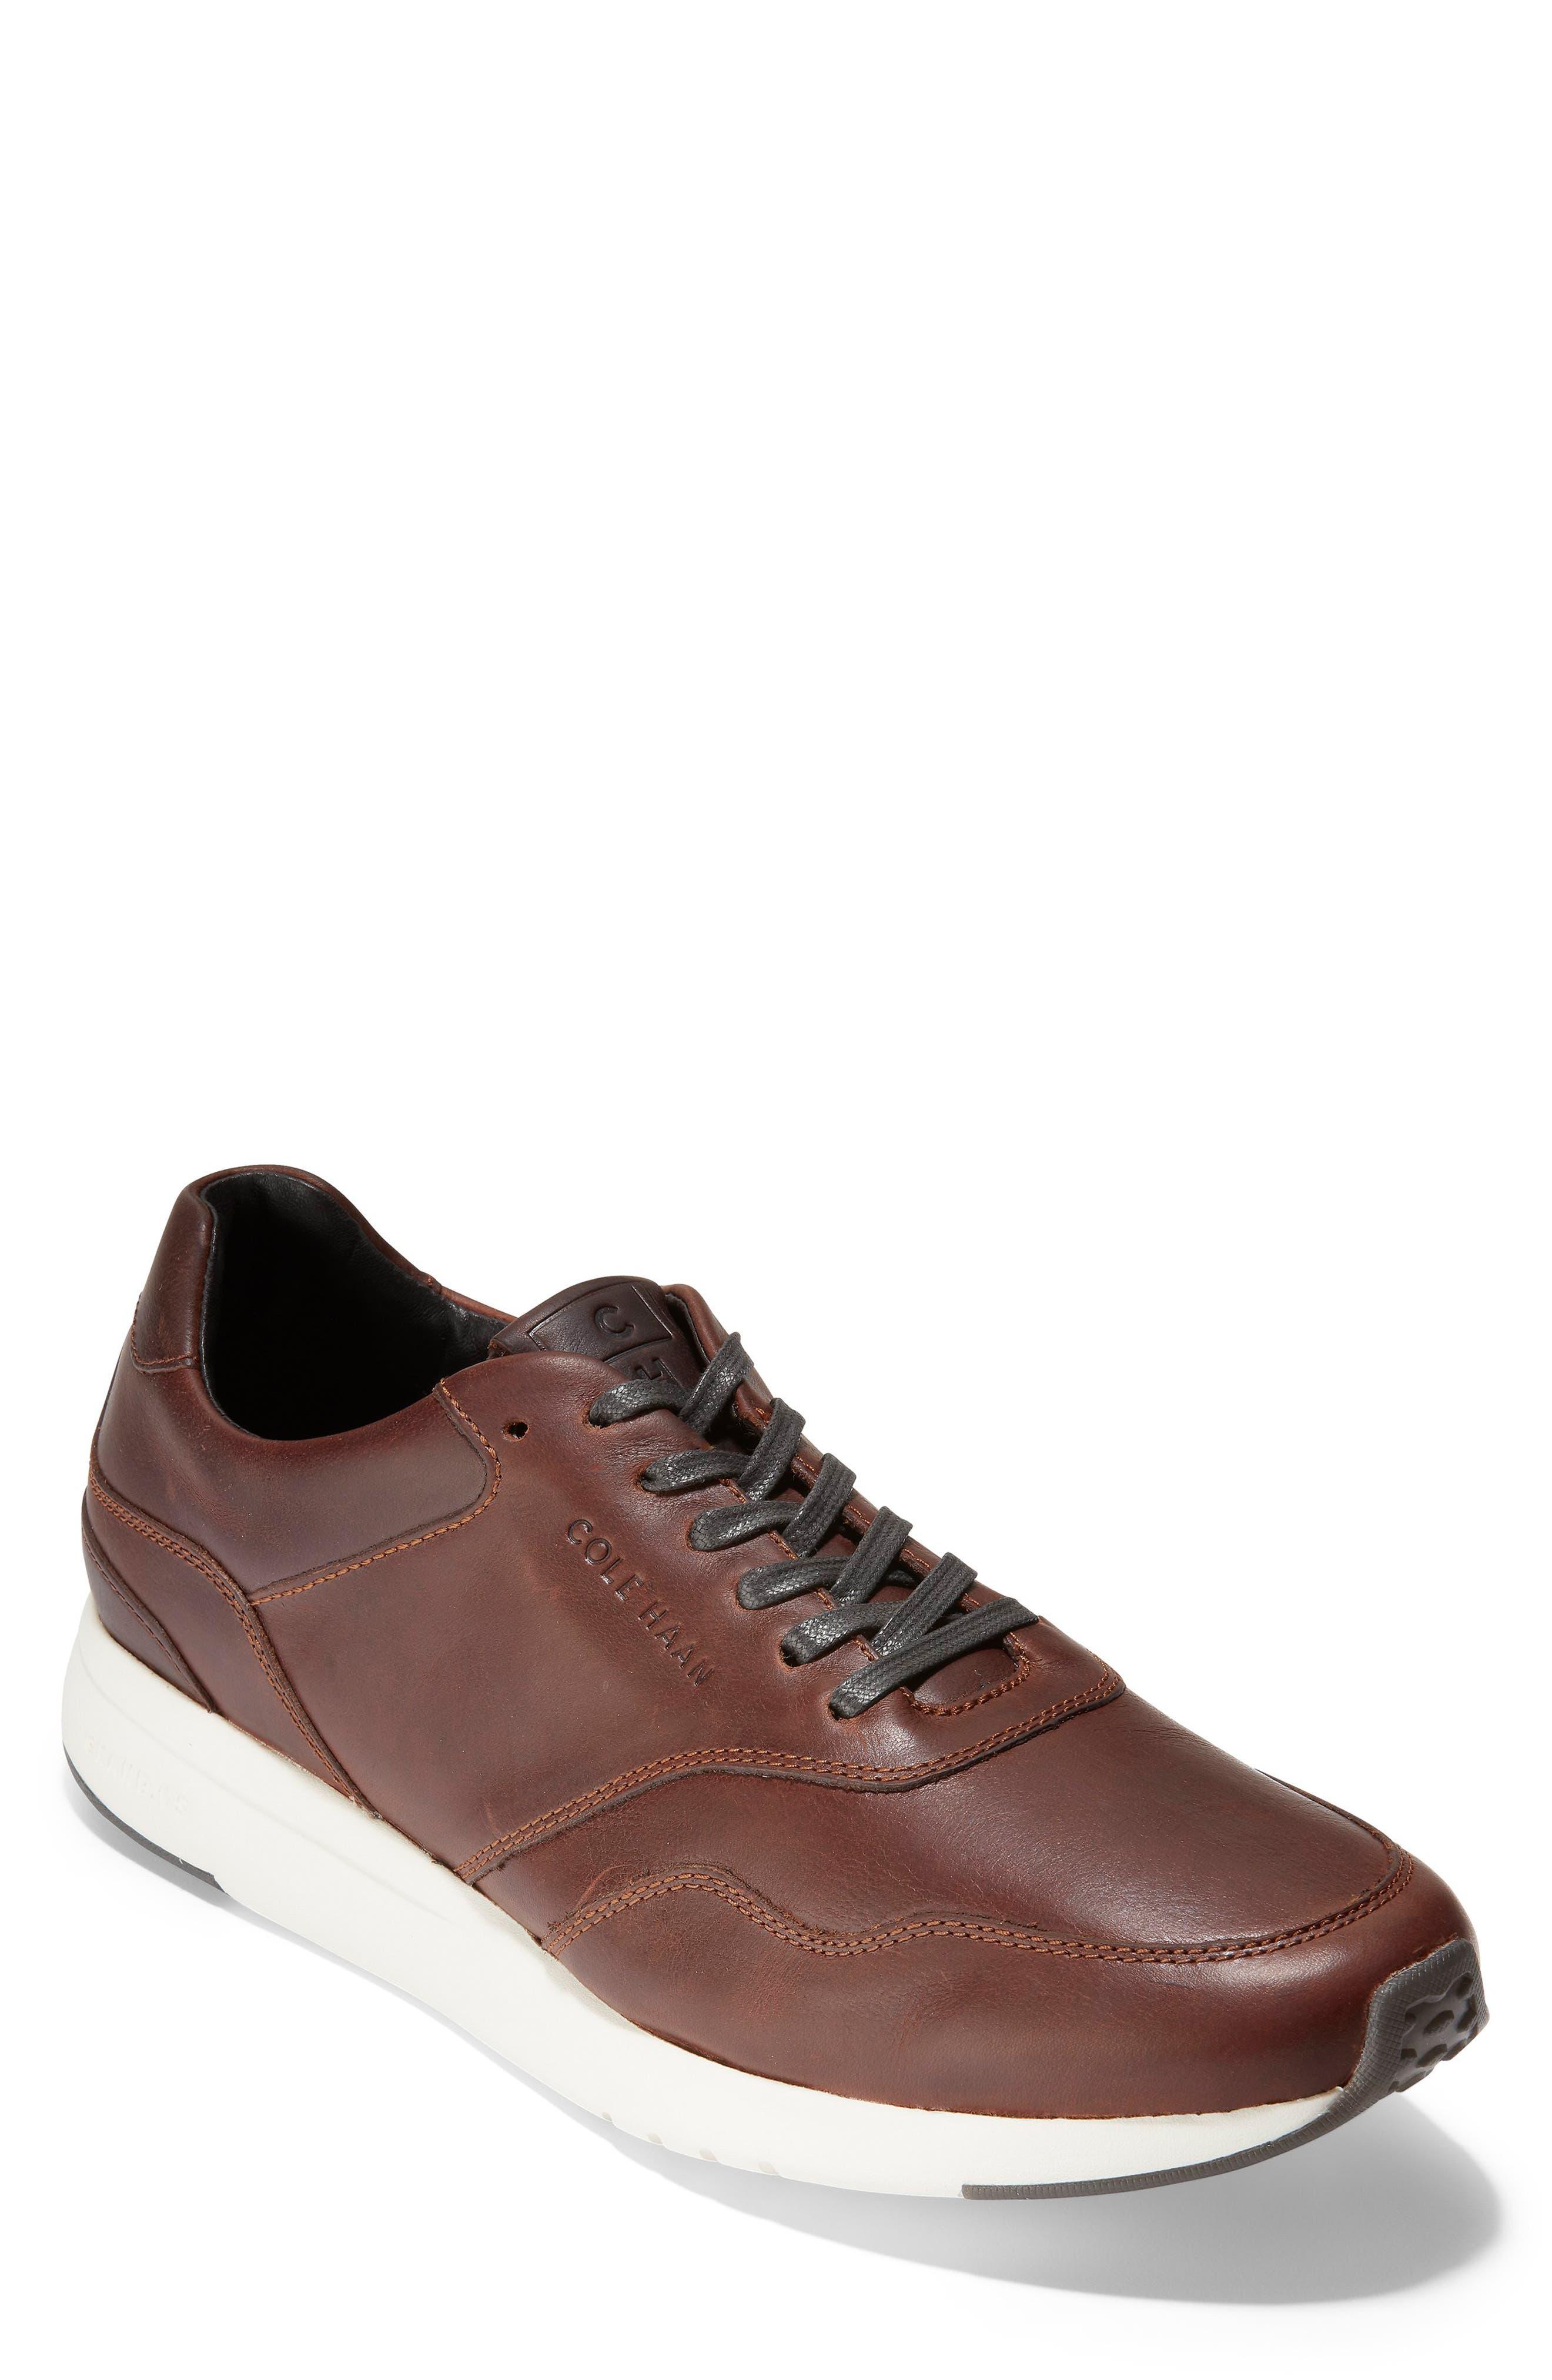 GrandPro Sneaker,                         Main,                         color, MESQUITE/ COFFEE LEATHER